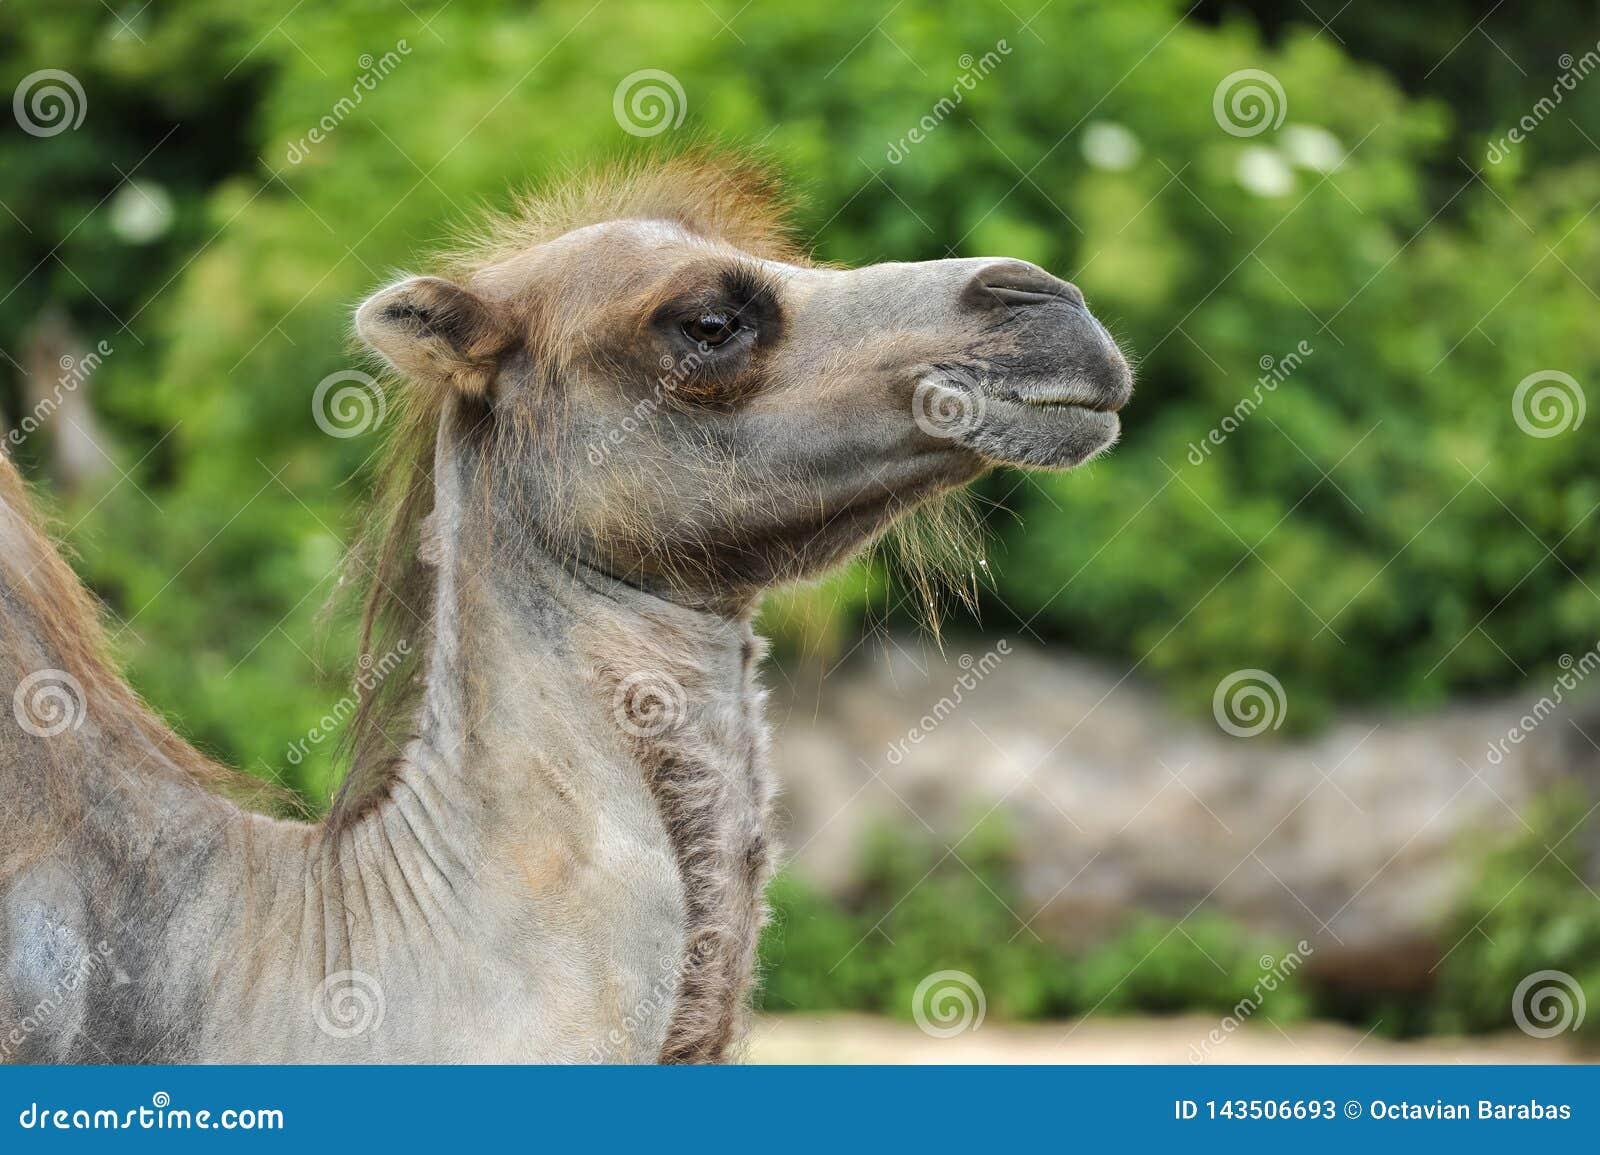 Profil av en hårig kamel i grön vegetation